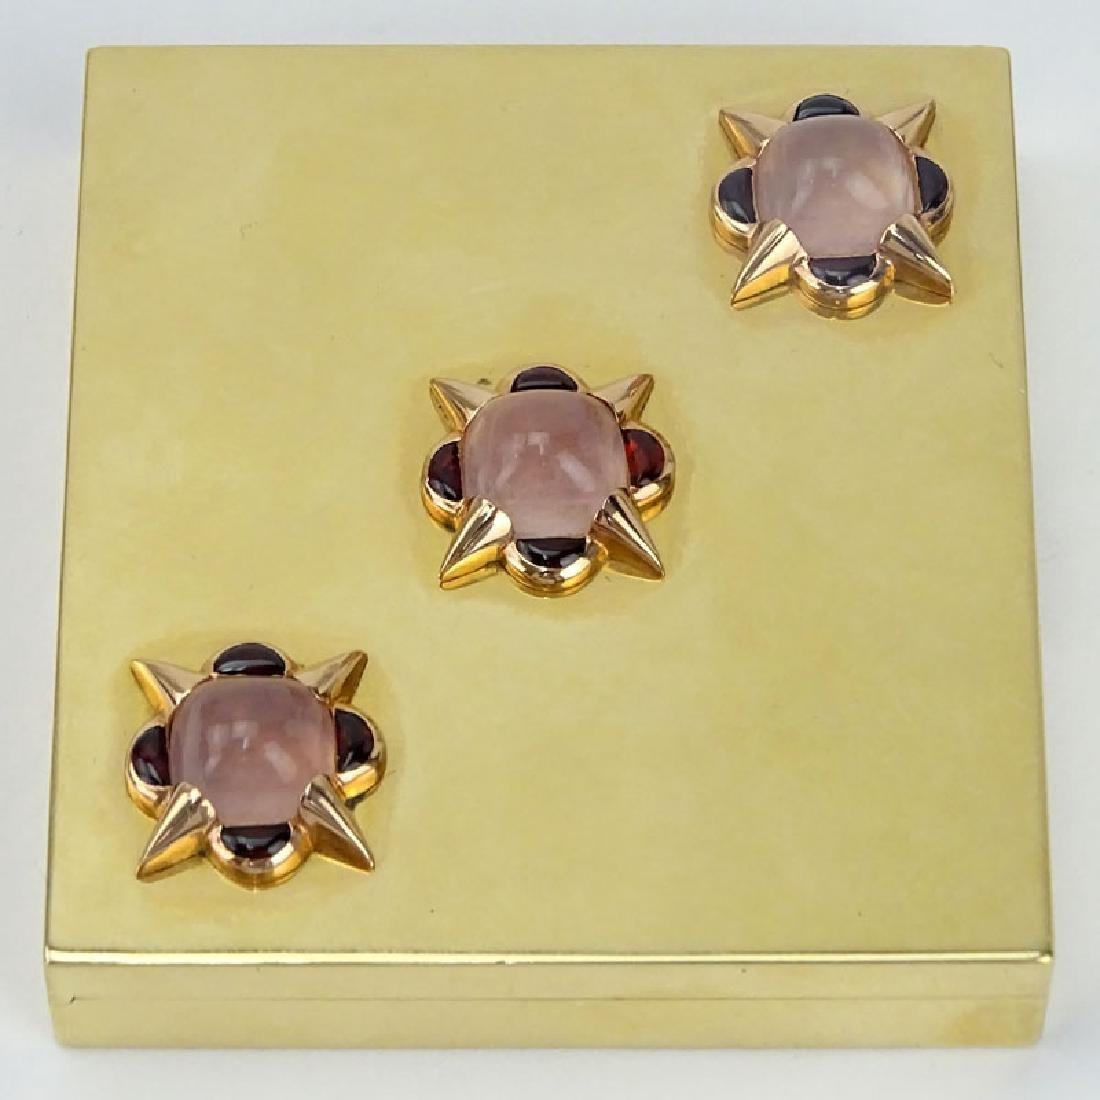 Vintage Verdura 14 Karat Yellow Gold and Gemstone